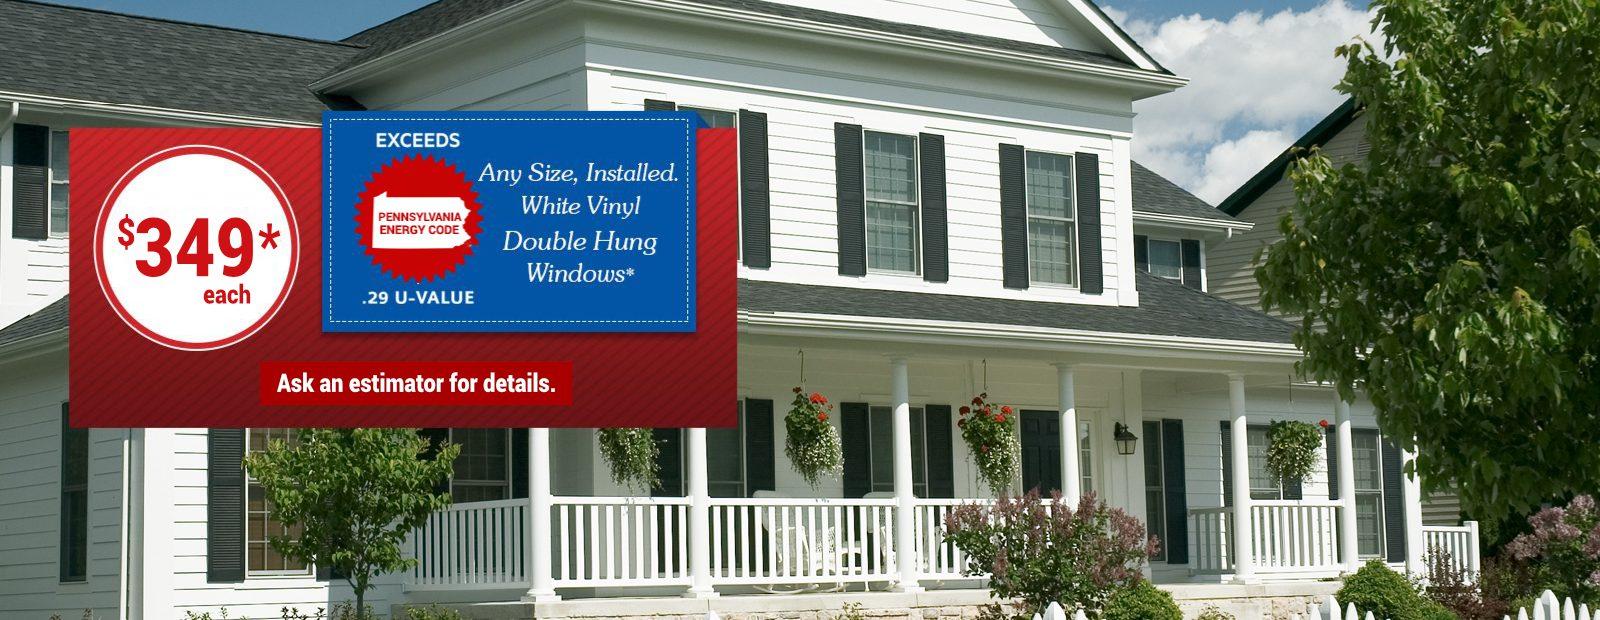 White Vinyl Double Hung Windows